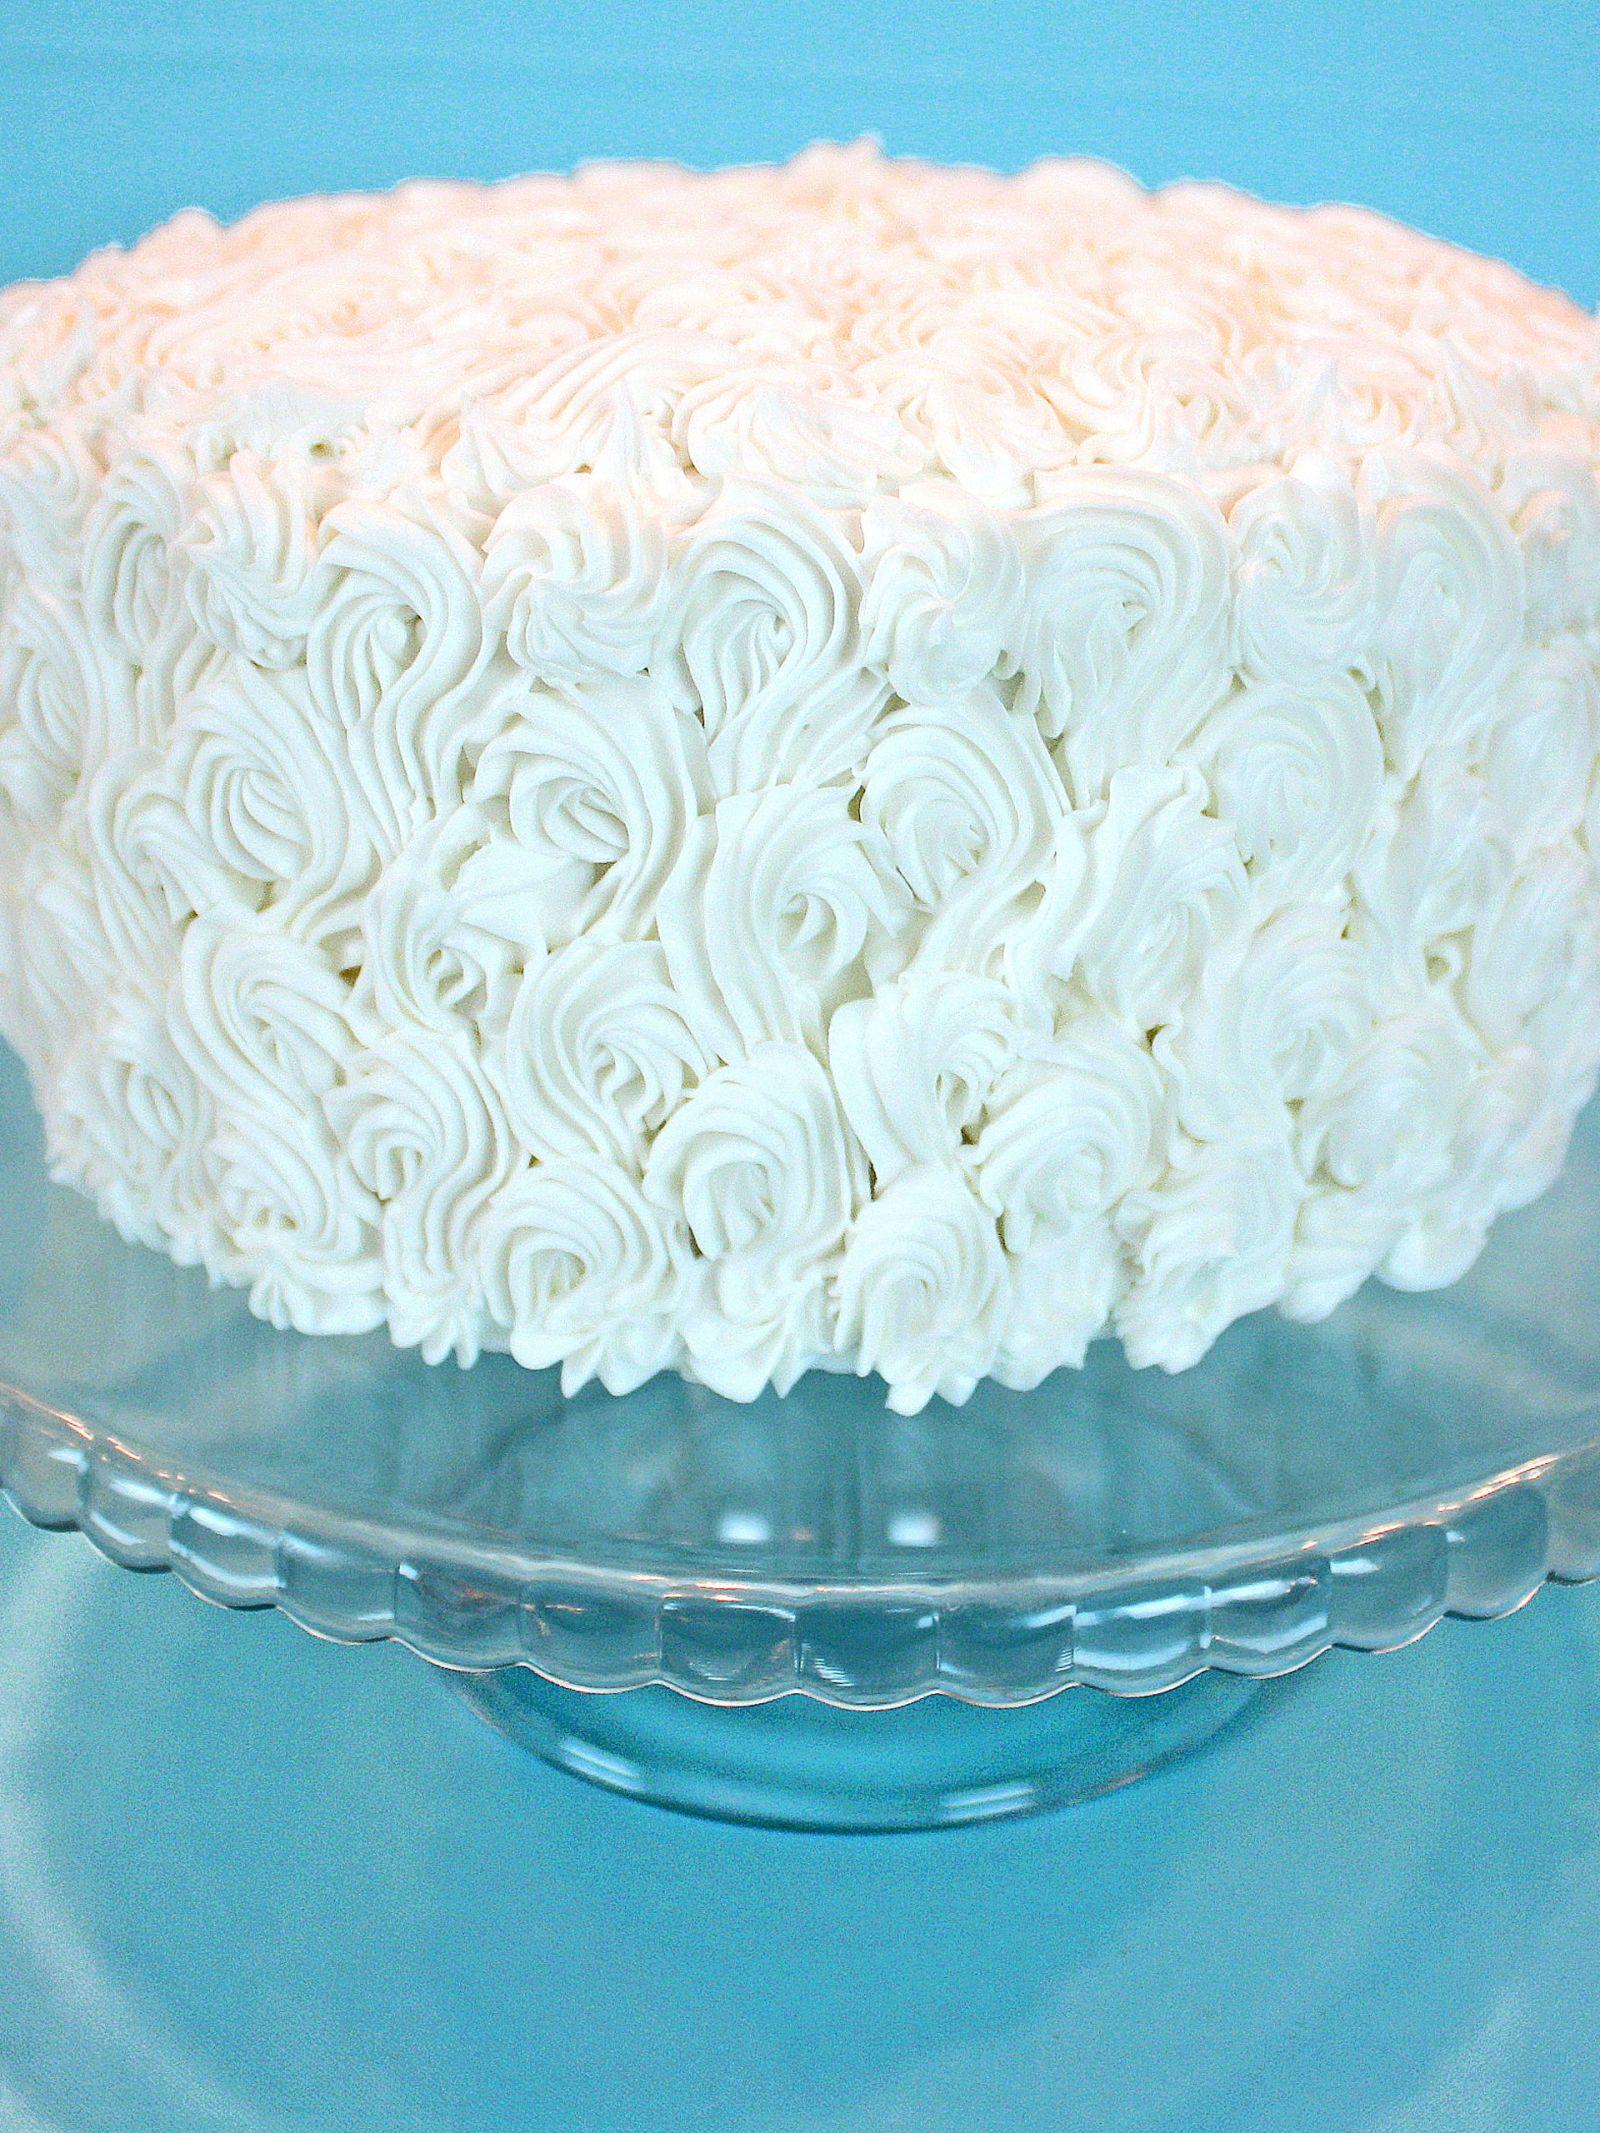 the surprise inside cake